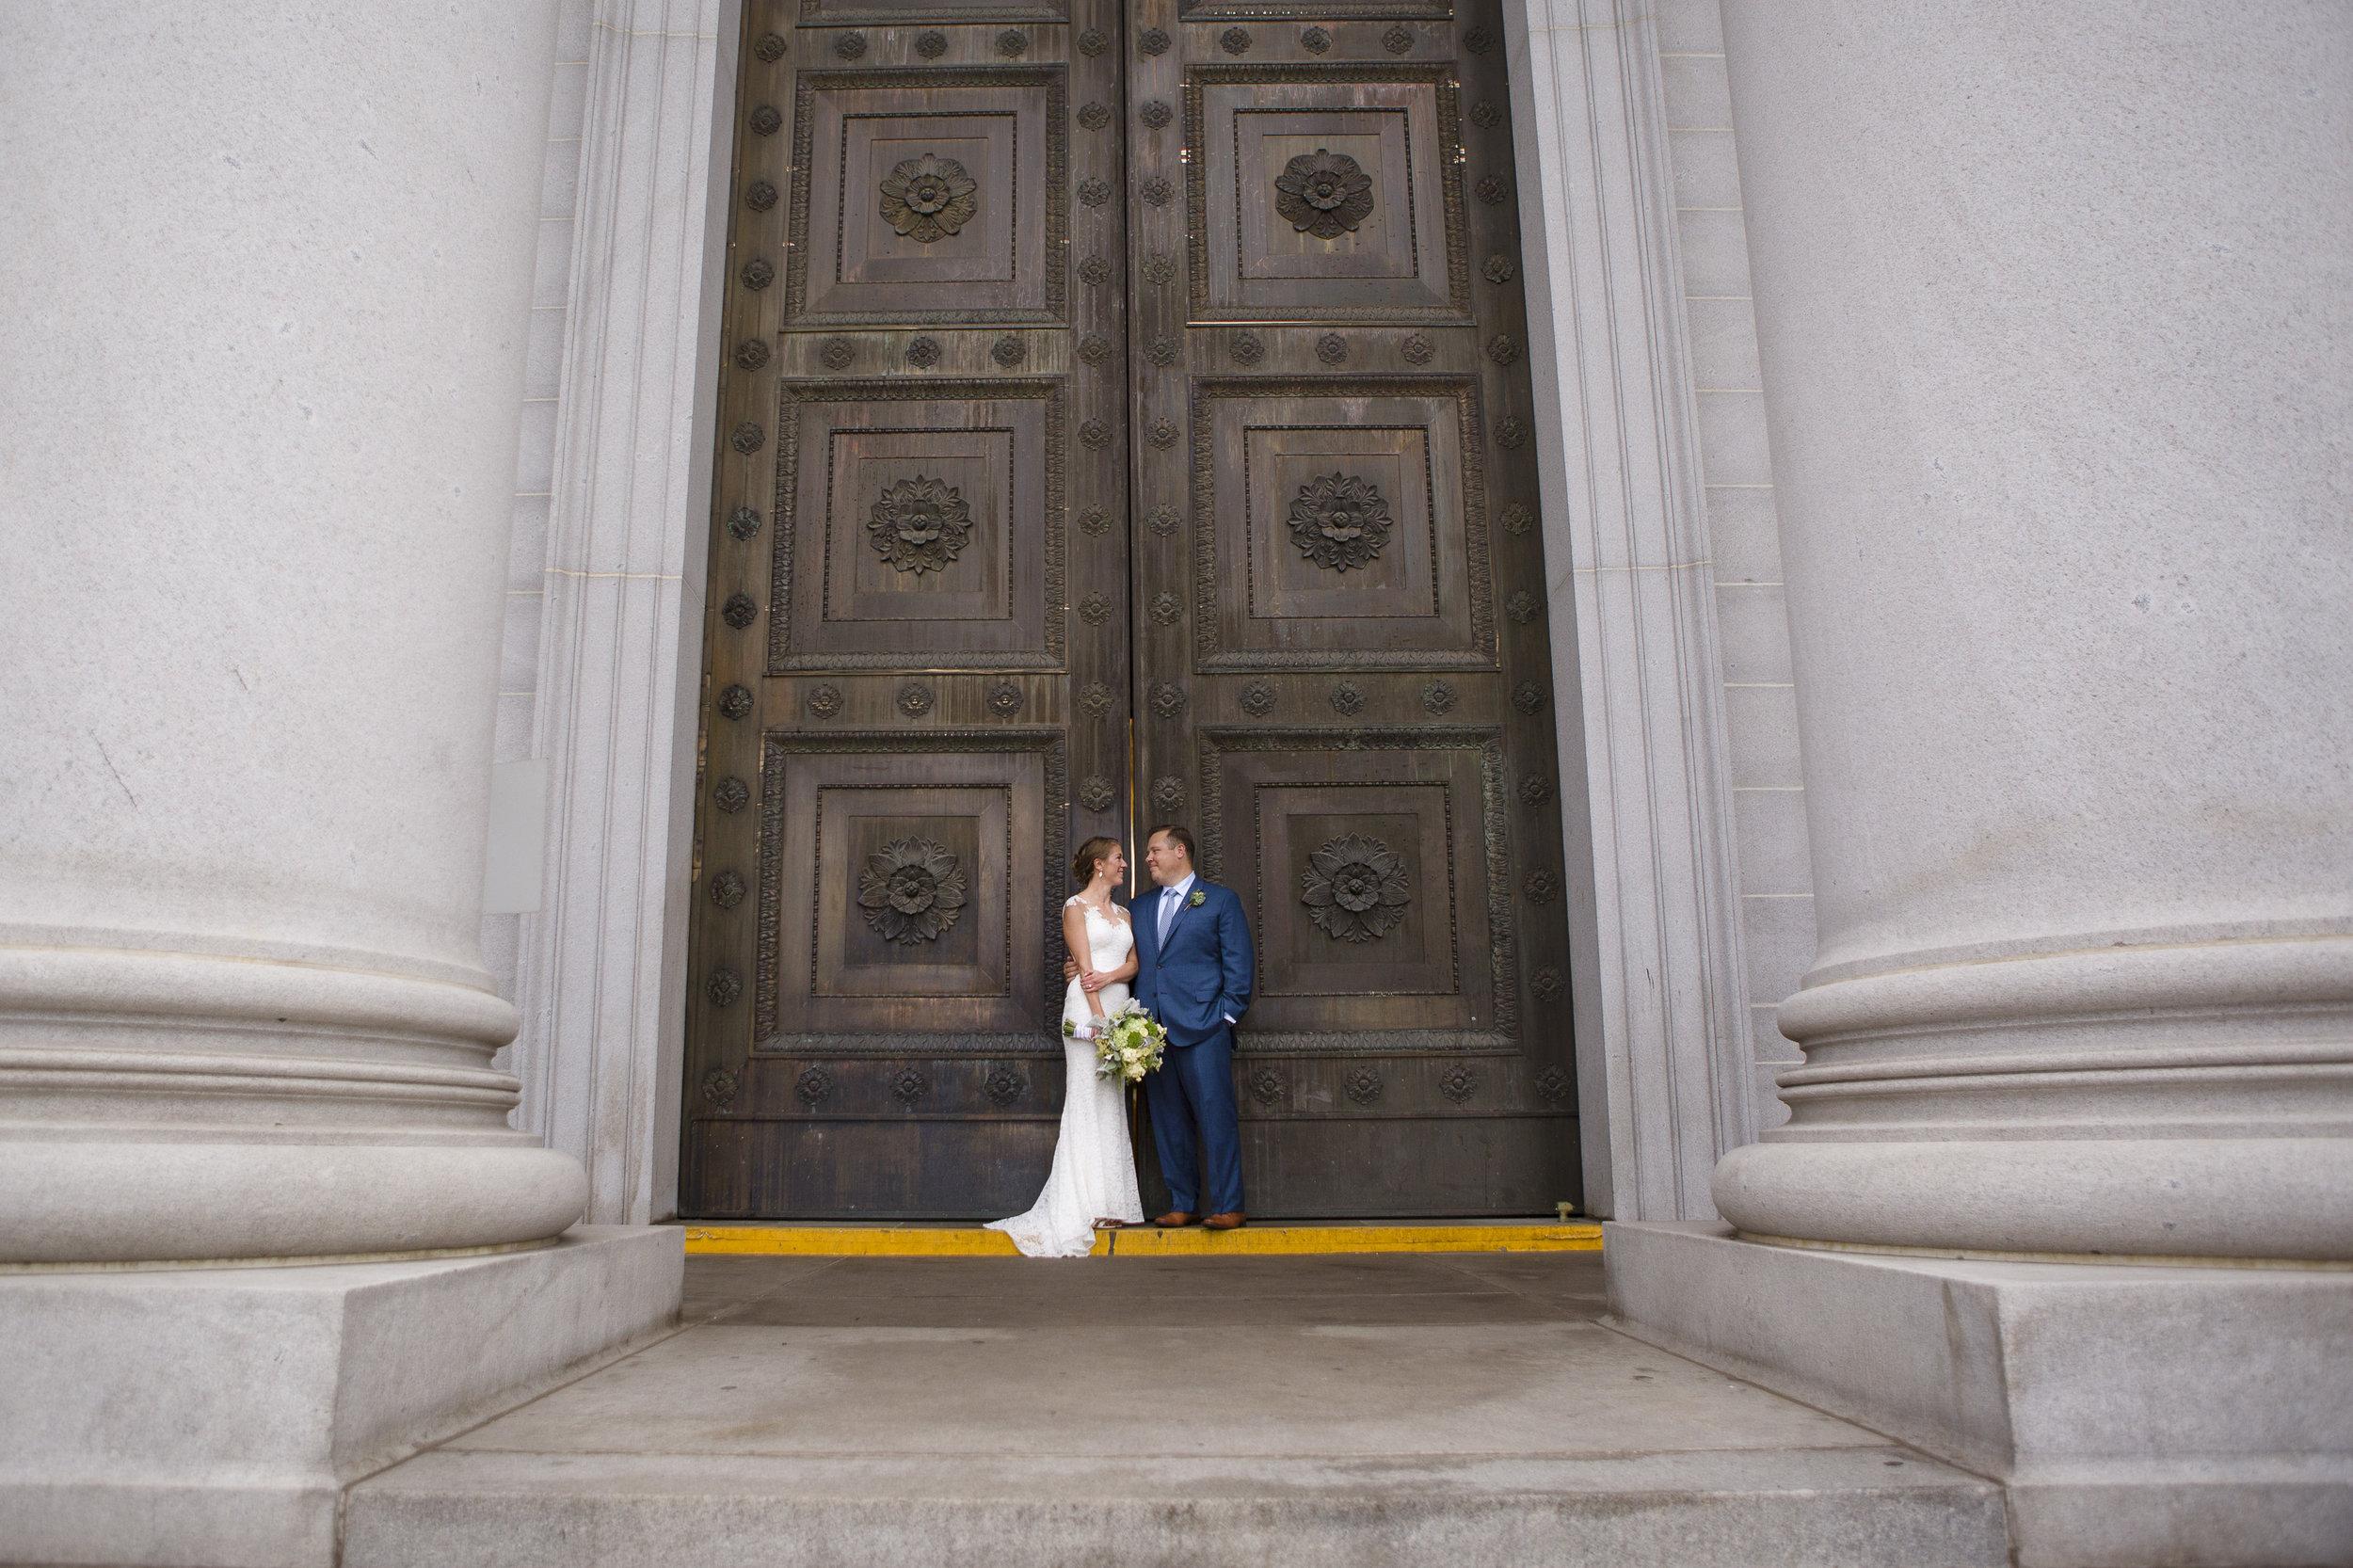 kristen-vance-downtown-denver-courthouse-colorado-wedding-2017-2.jpg